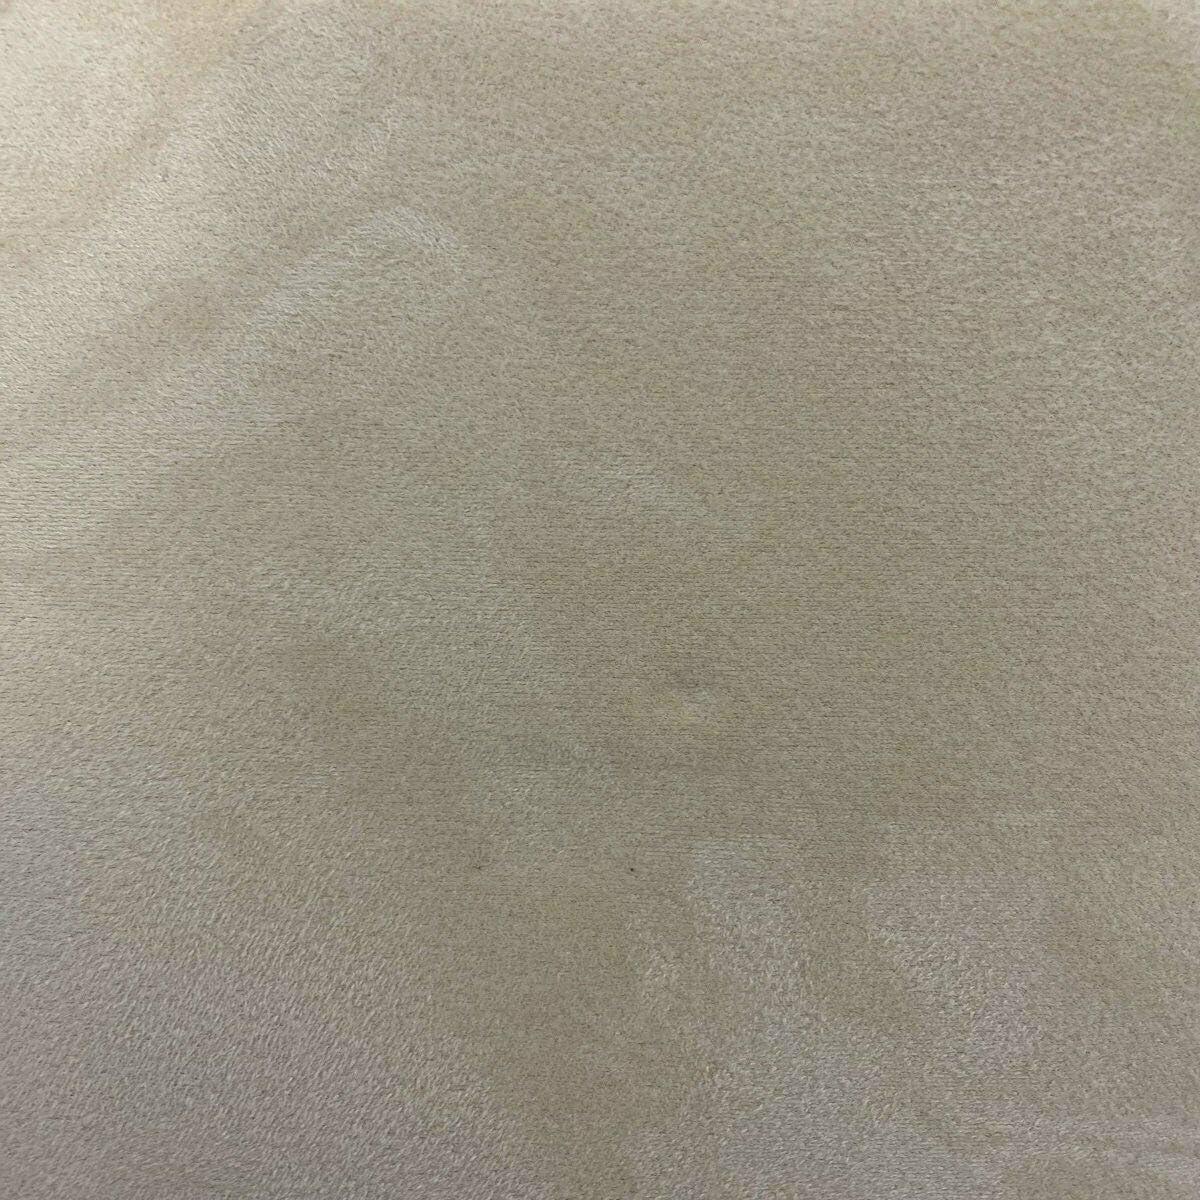 Fashion Fabrics Sand Beige Luxury Suede Auto Stretch Backed Foam Mesa Mall Special price